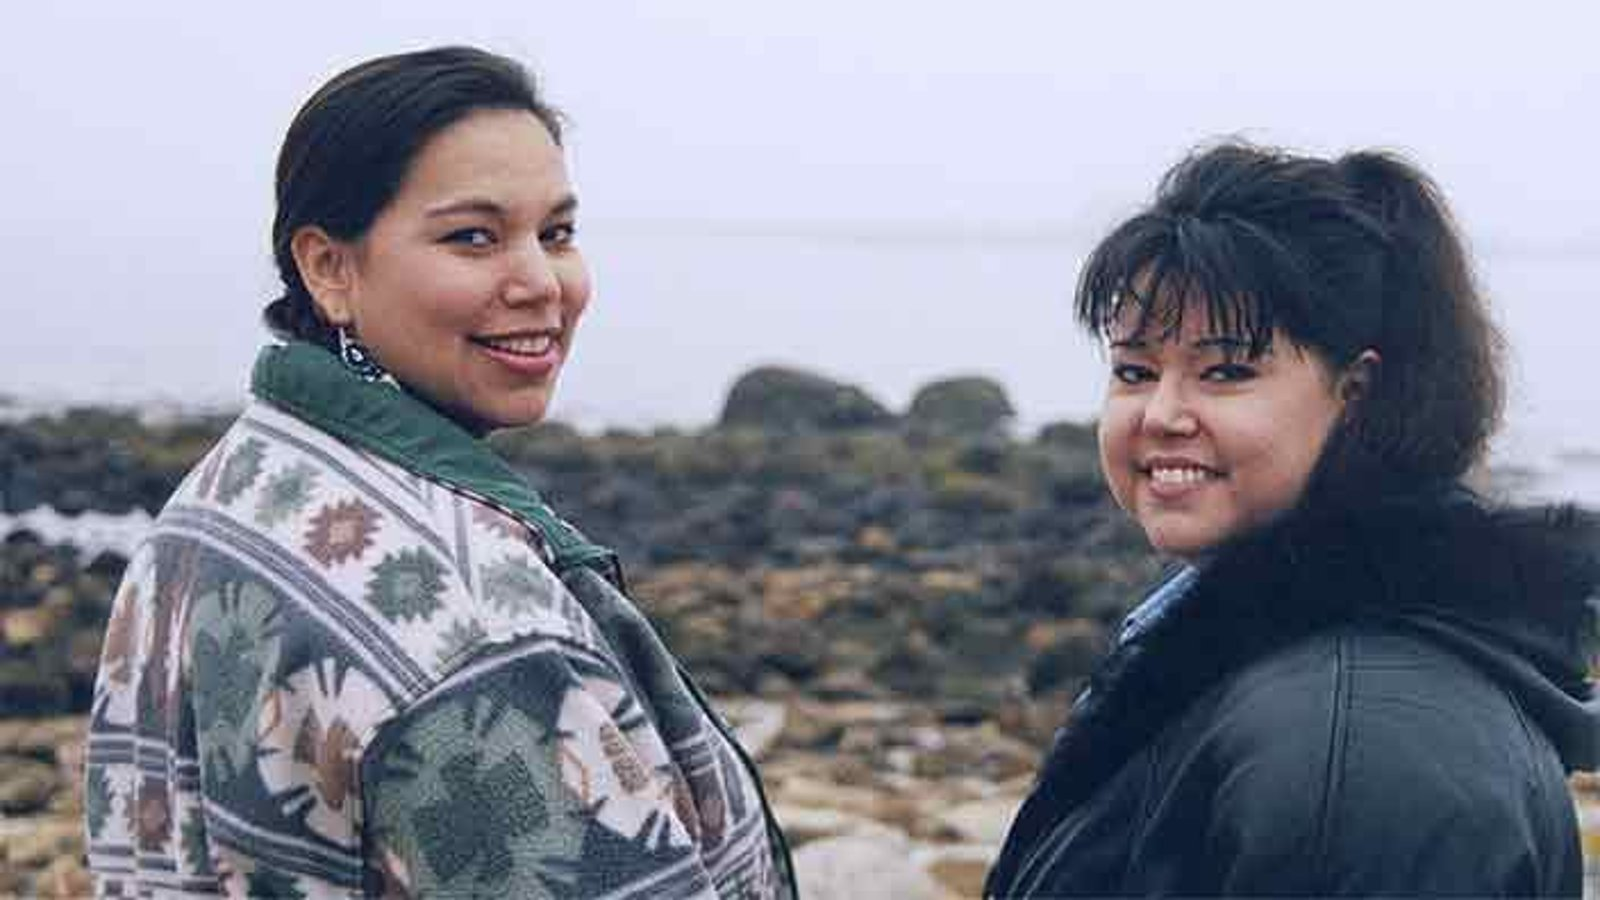 The Spirit of Annie Mae - A Native American Activist